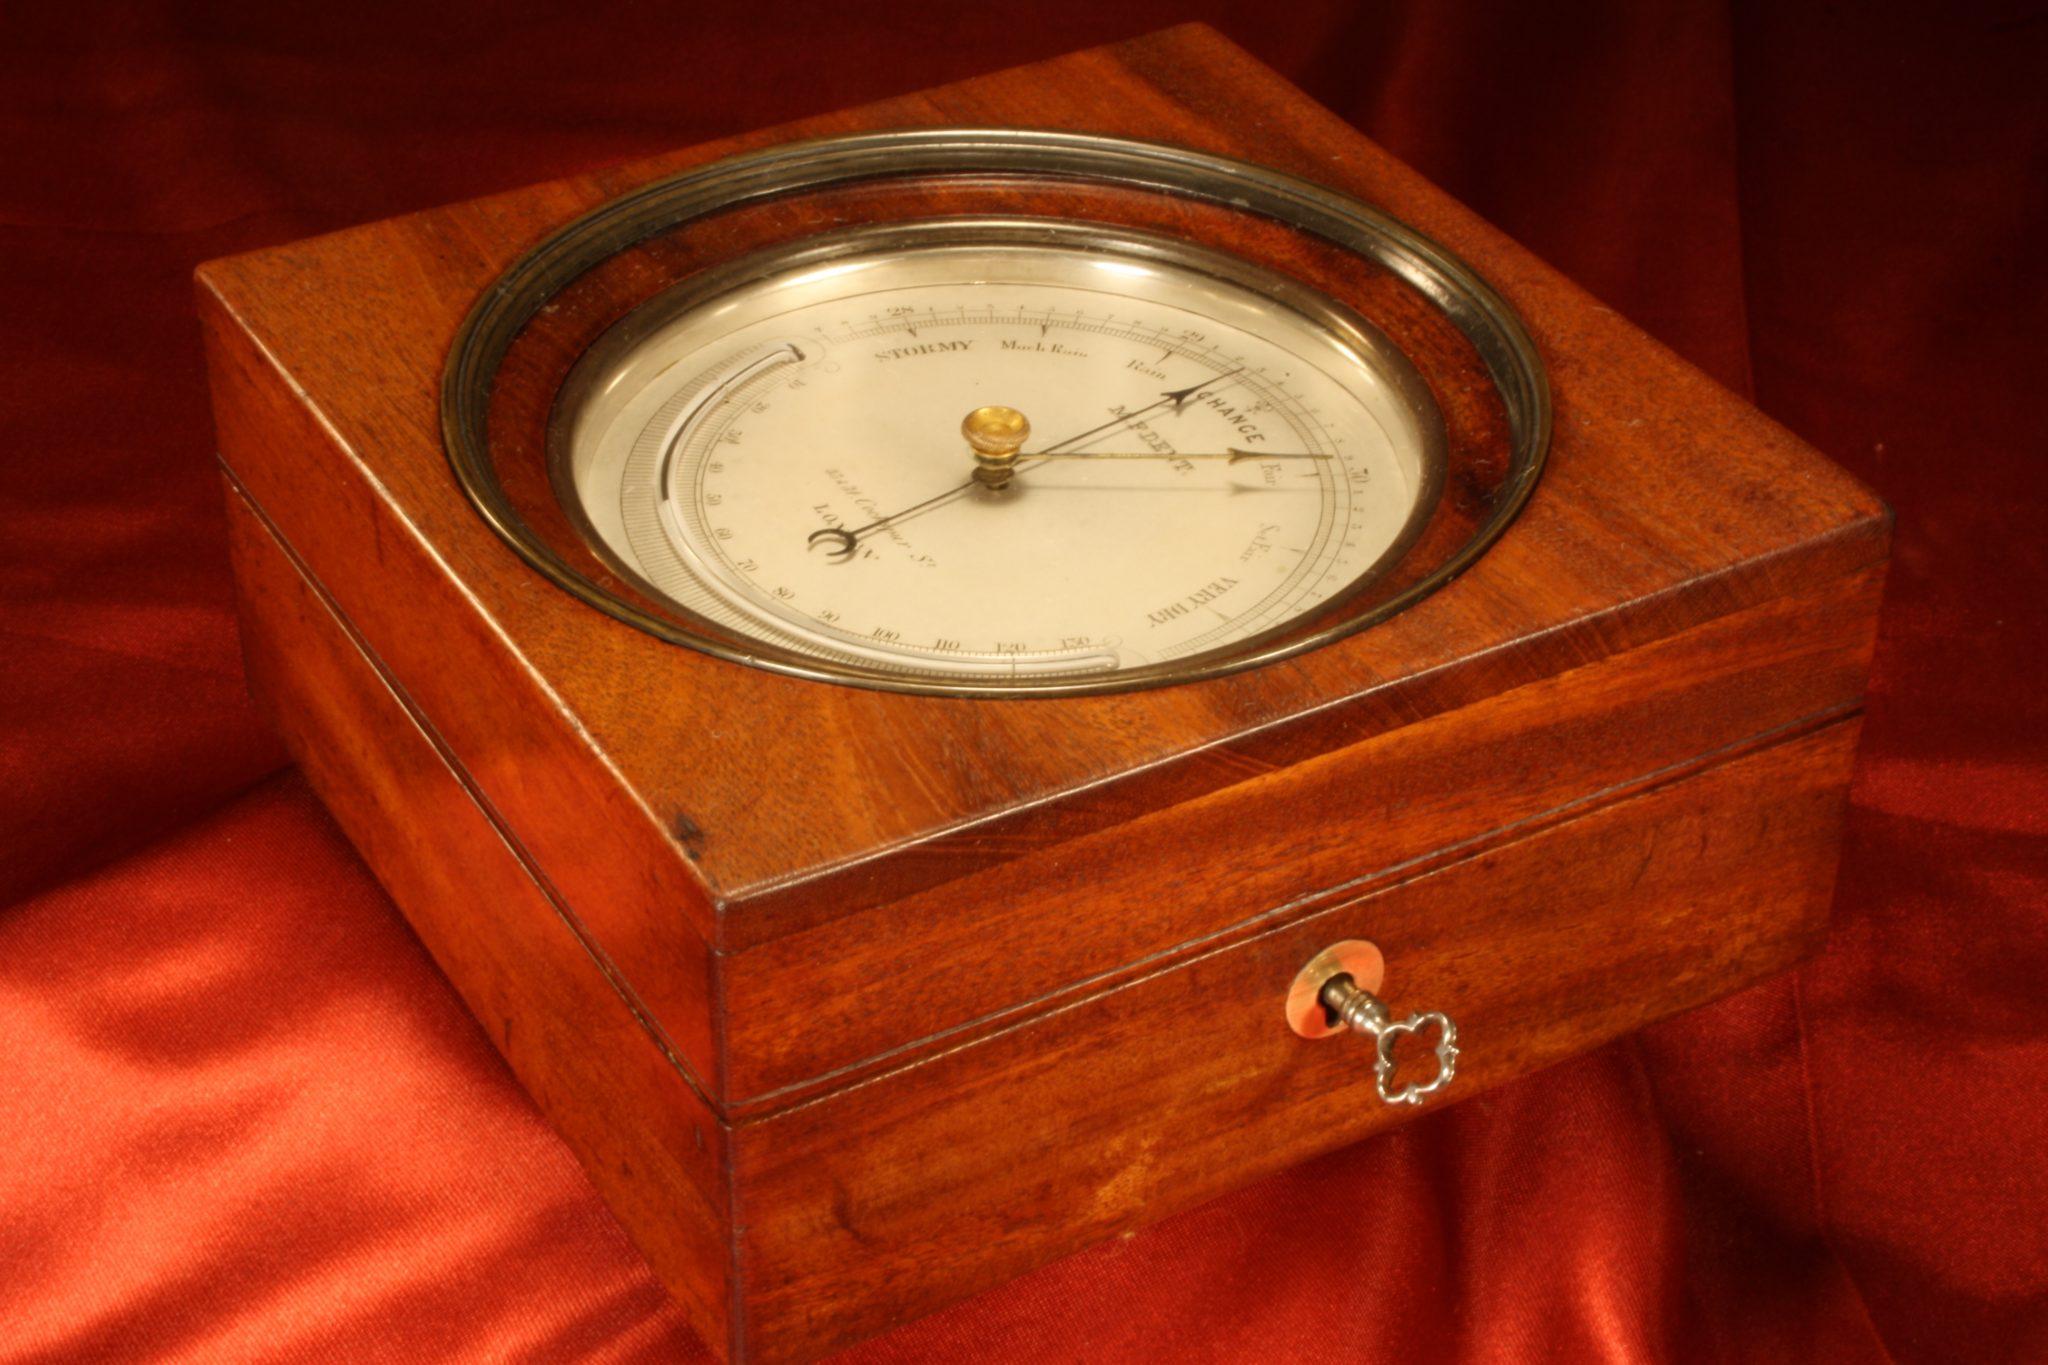 Image of MF Dent Barometer c1865